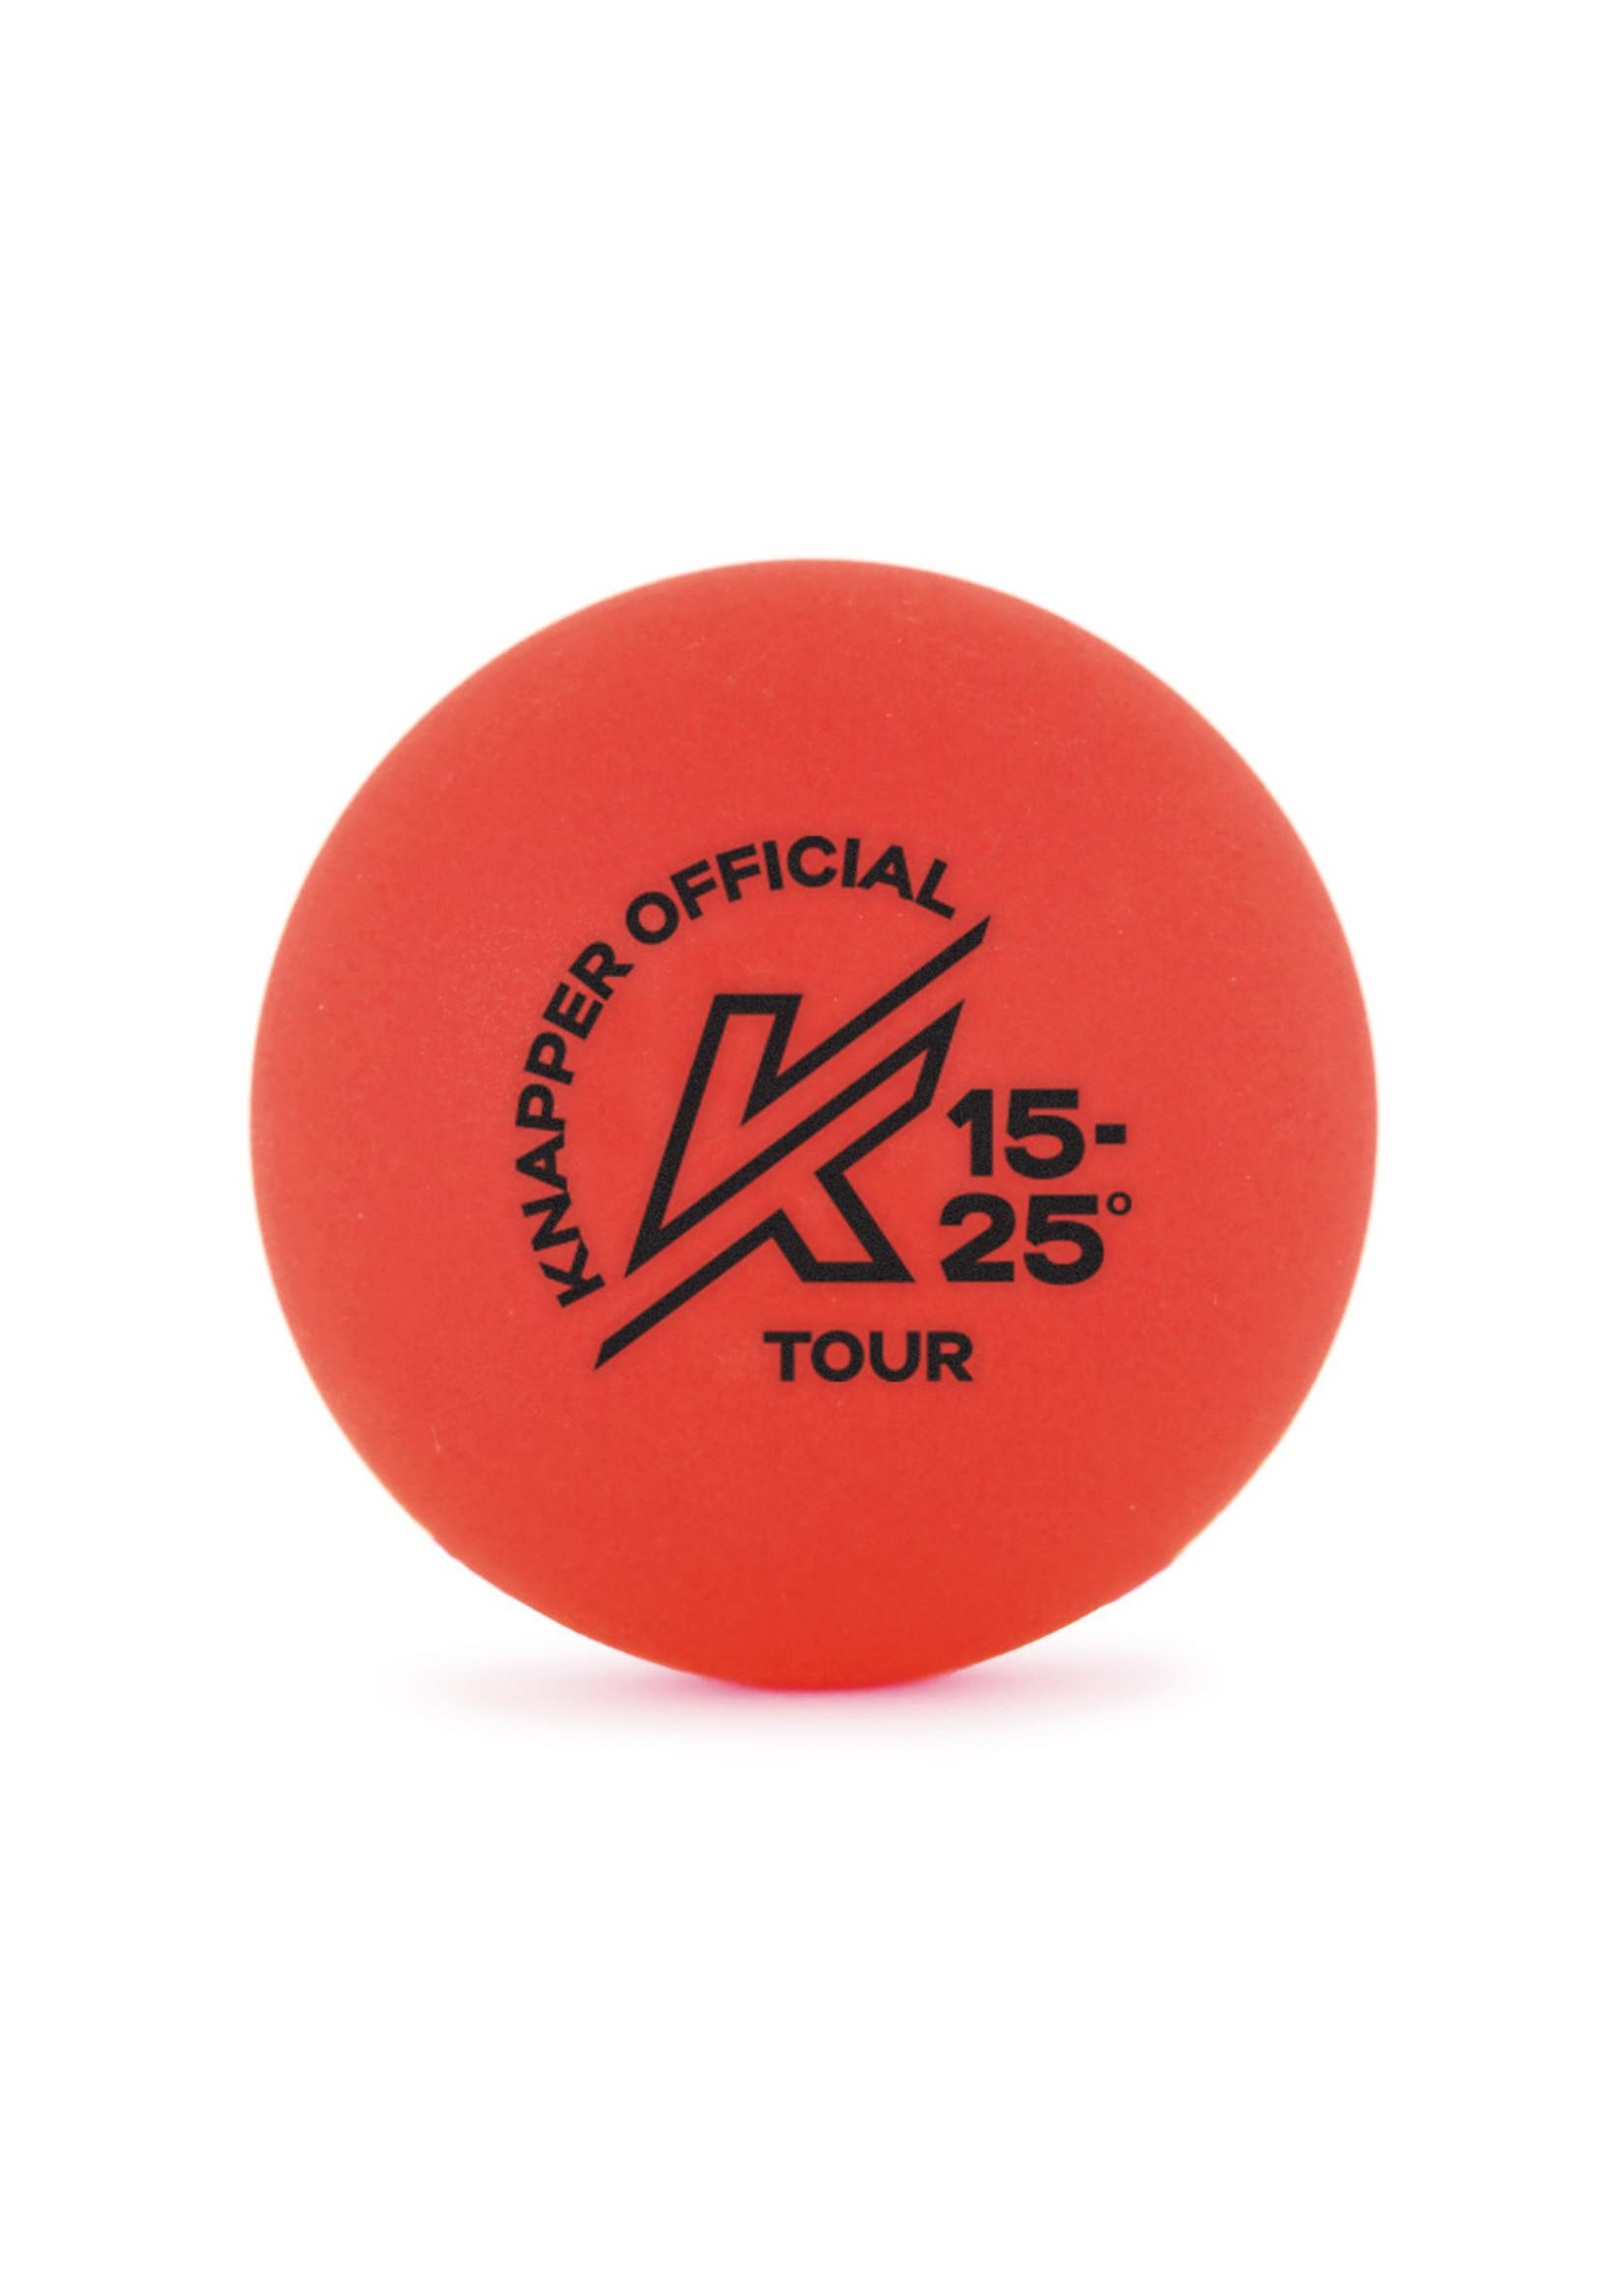 Knapper KNAPPER AK TOUR ORANGE BALL by D-Gel